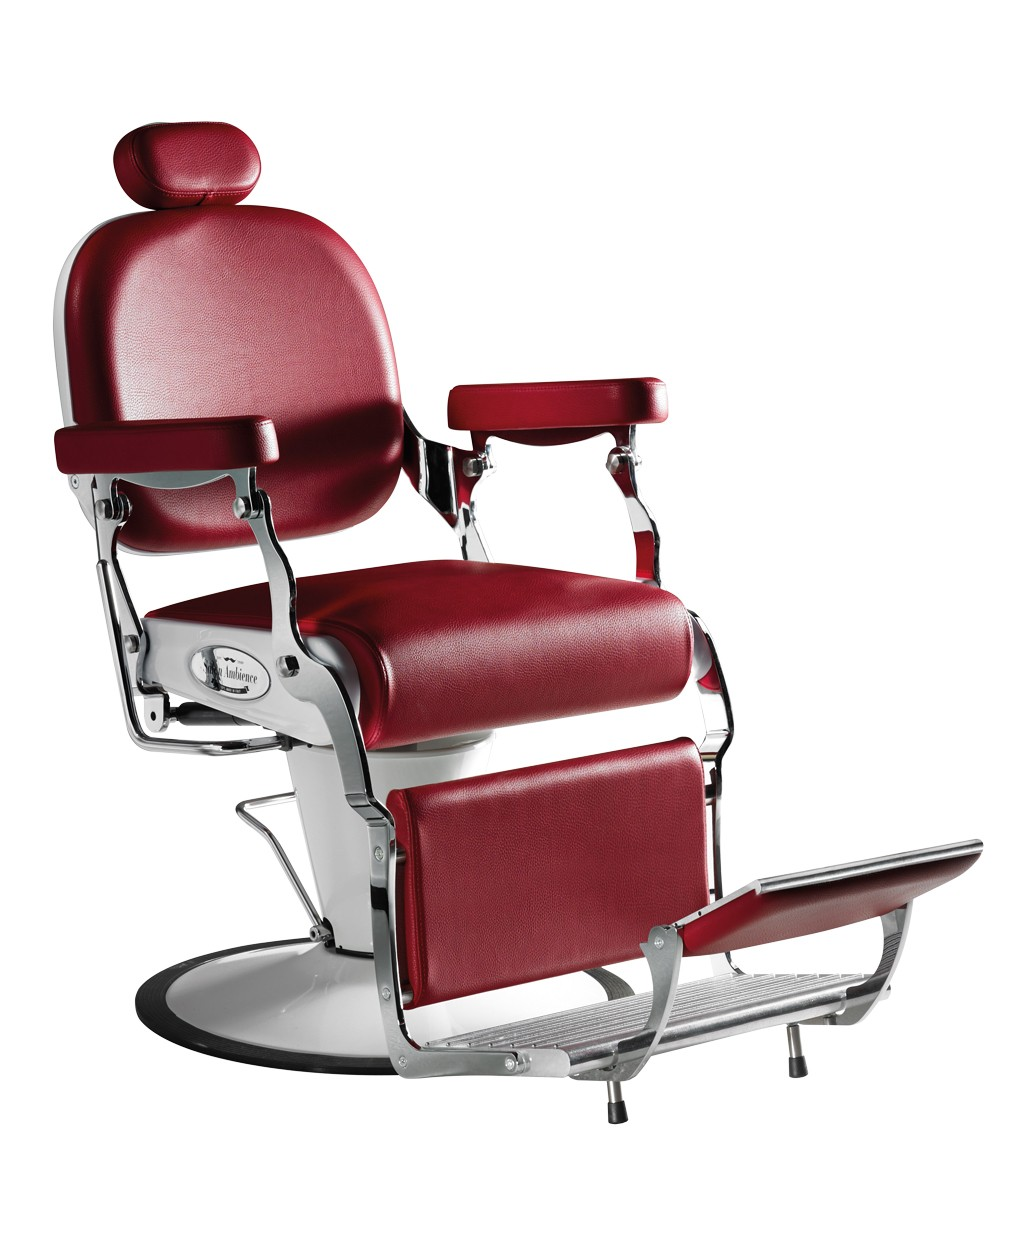 Salon Ambience SH2776 Premier Italian Barber Chair